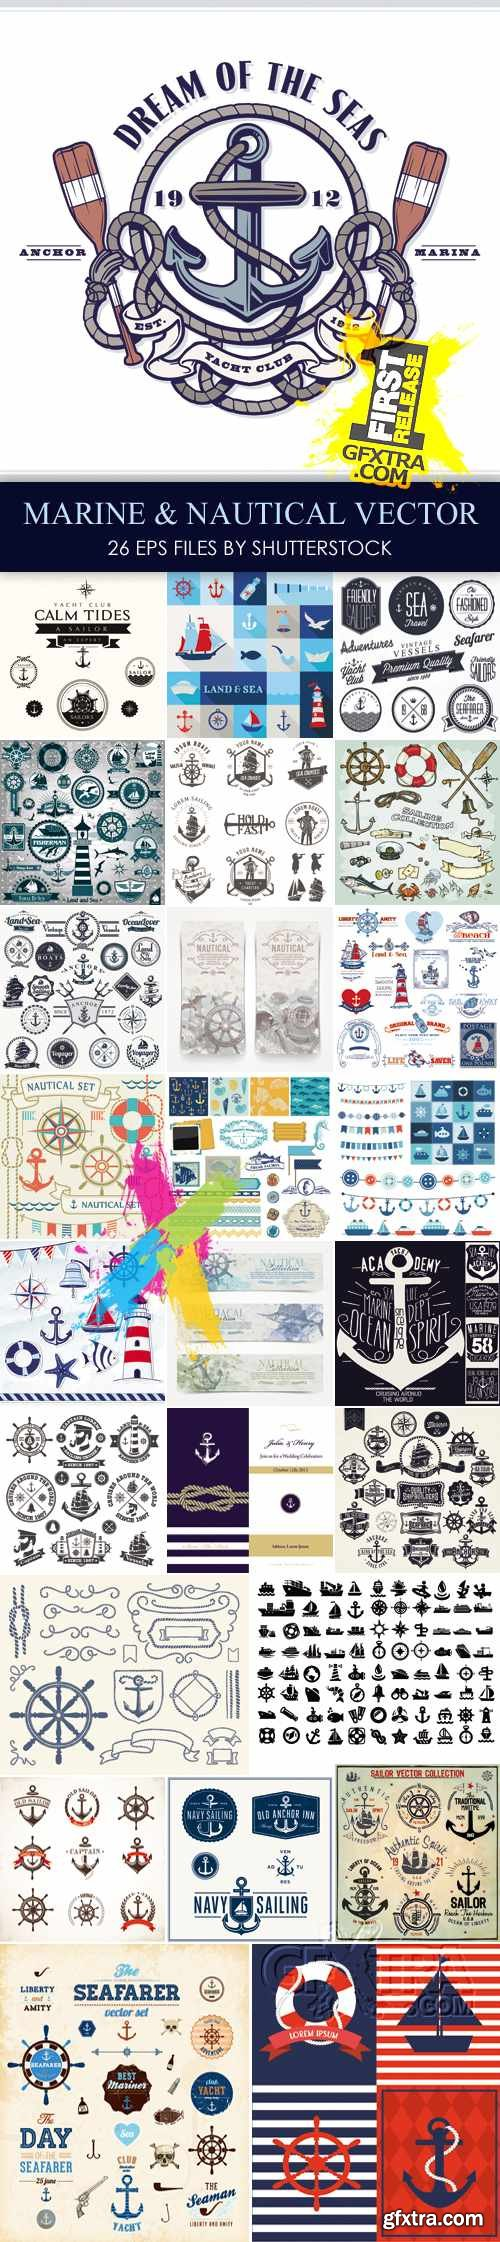 Stock Vector - Marine & Nautical Elements